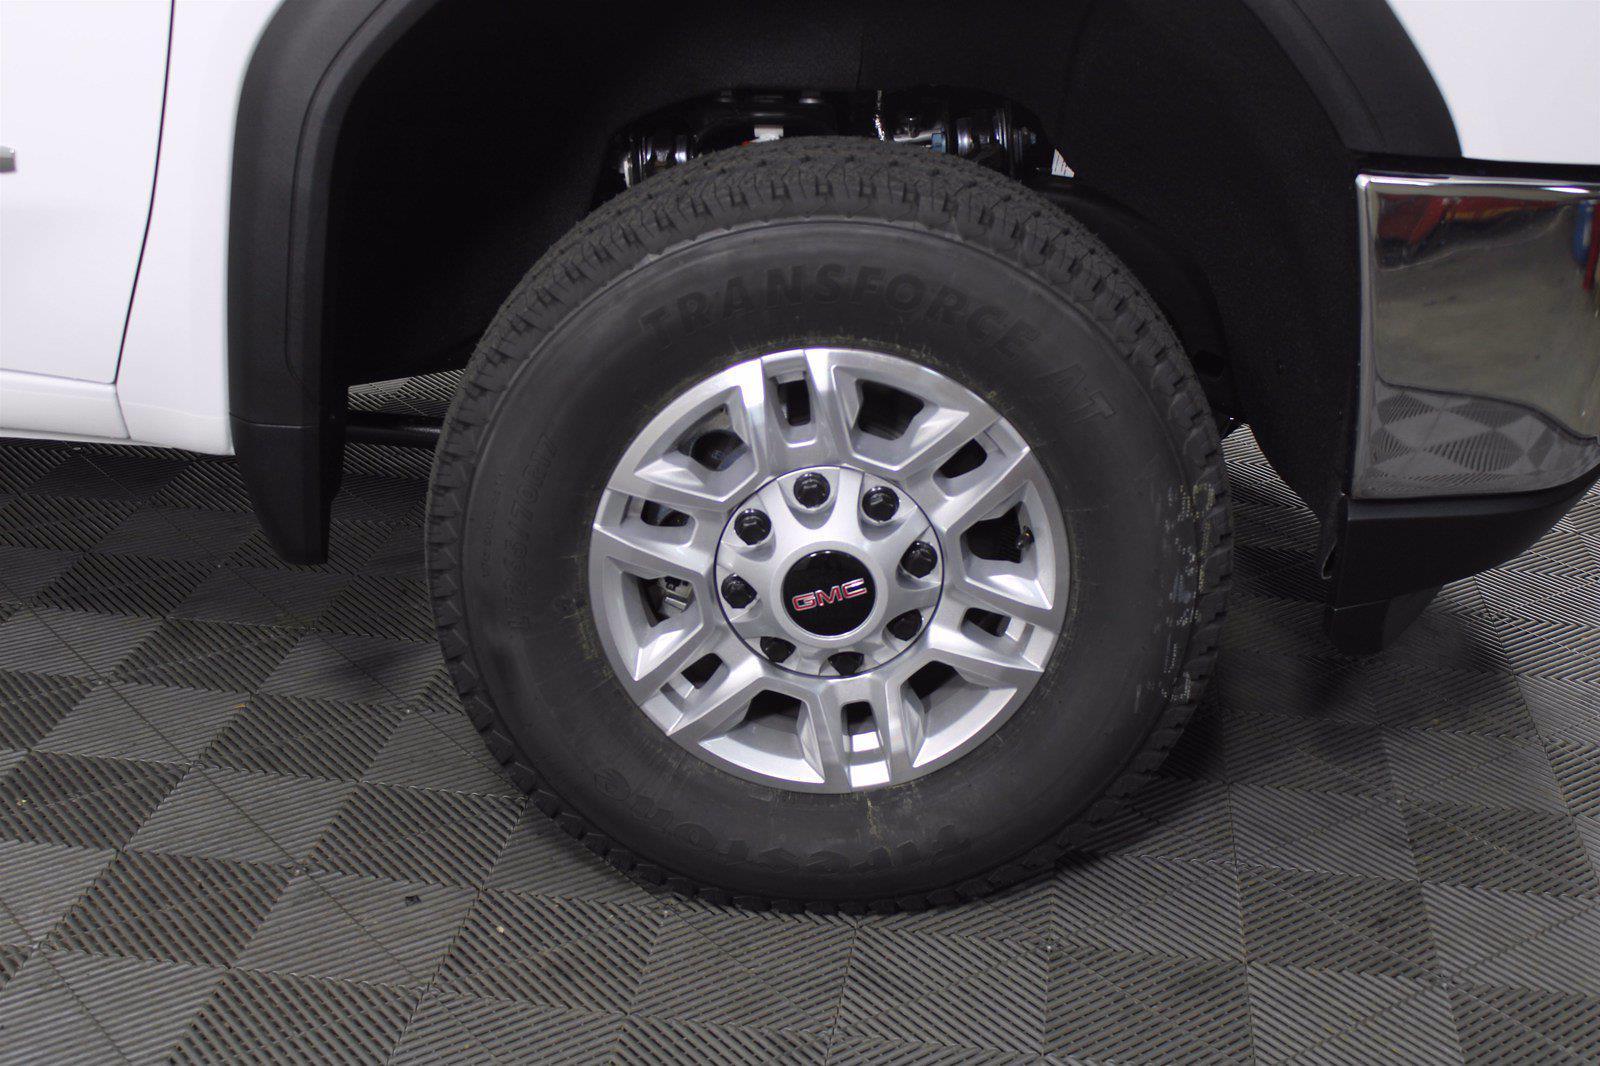 2022 Sierra 2500 Regular Cab 4x4,  Pickup #D420037 - photo 6